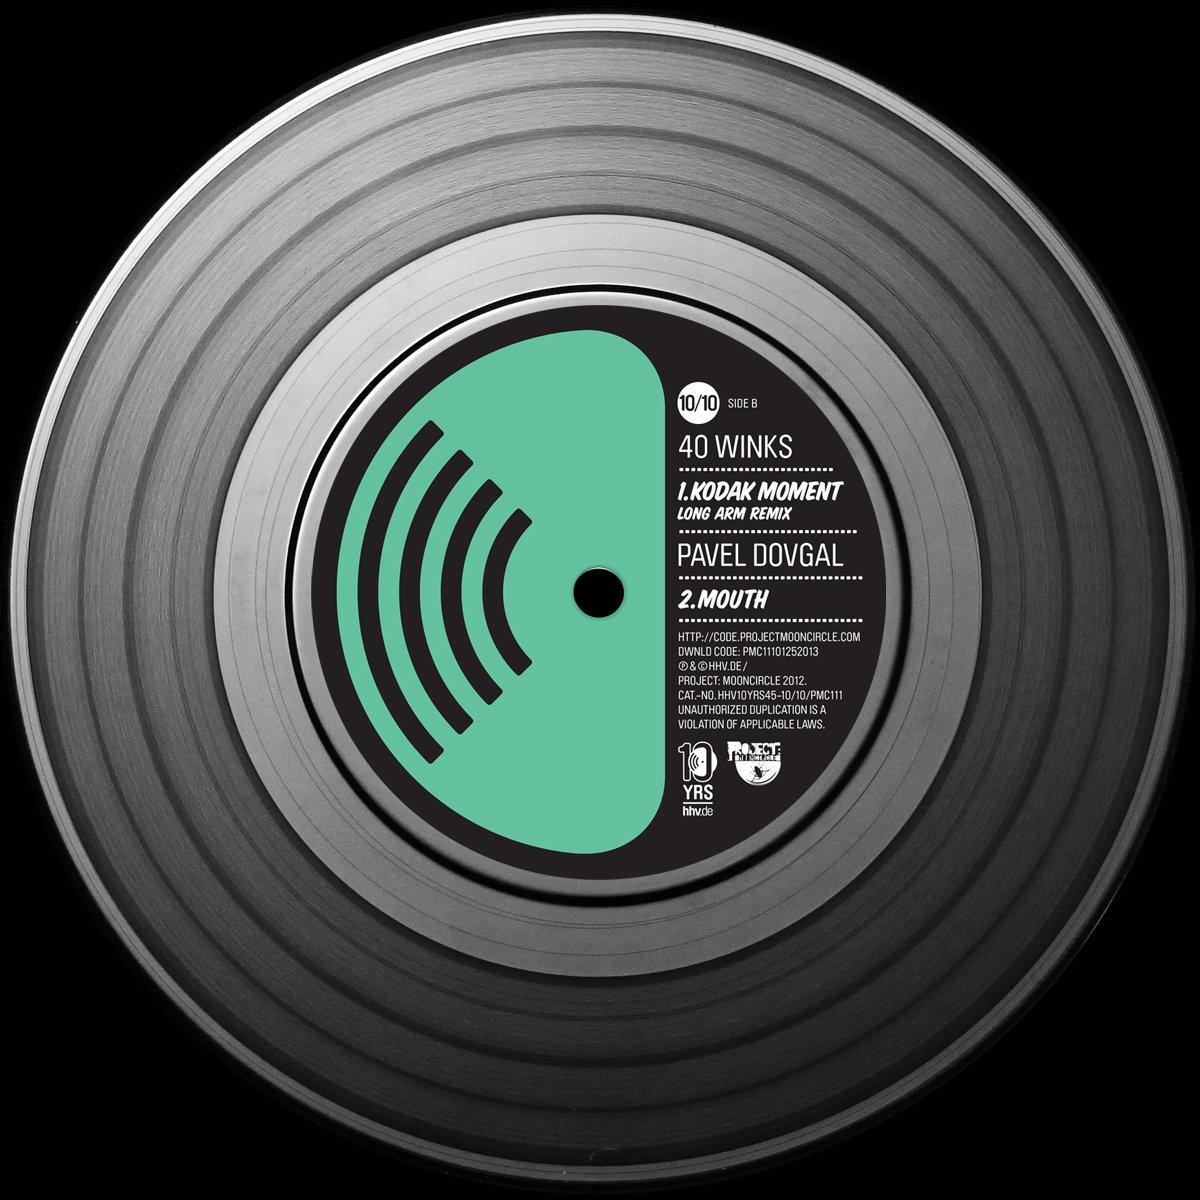 Kodak Moment (Long Arm Remix) | PROJECT MOONCIRCLE